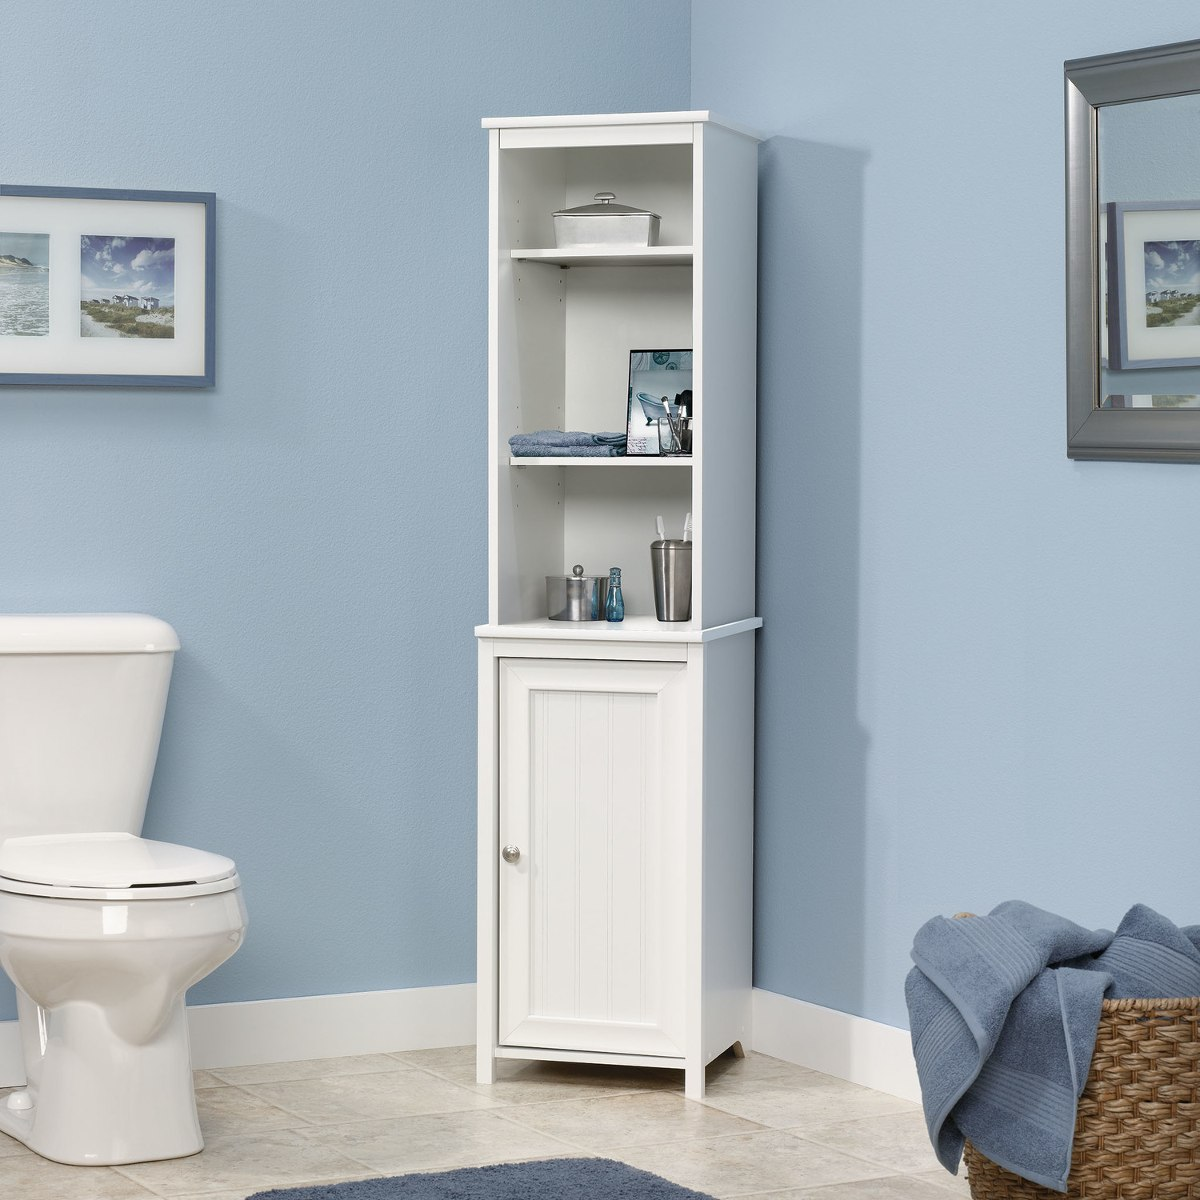 mueble toallero tolva para baño artesanal - $ 21.069,22 en mercado ... - Muebles Toalleros Para Banos